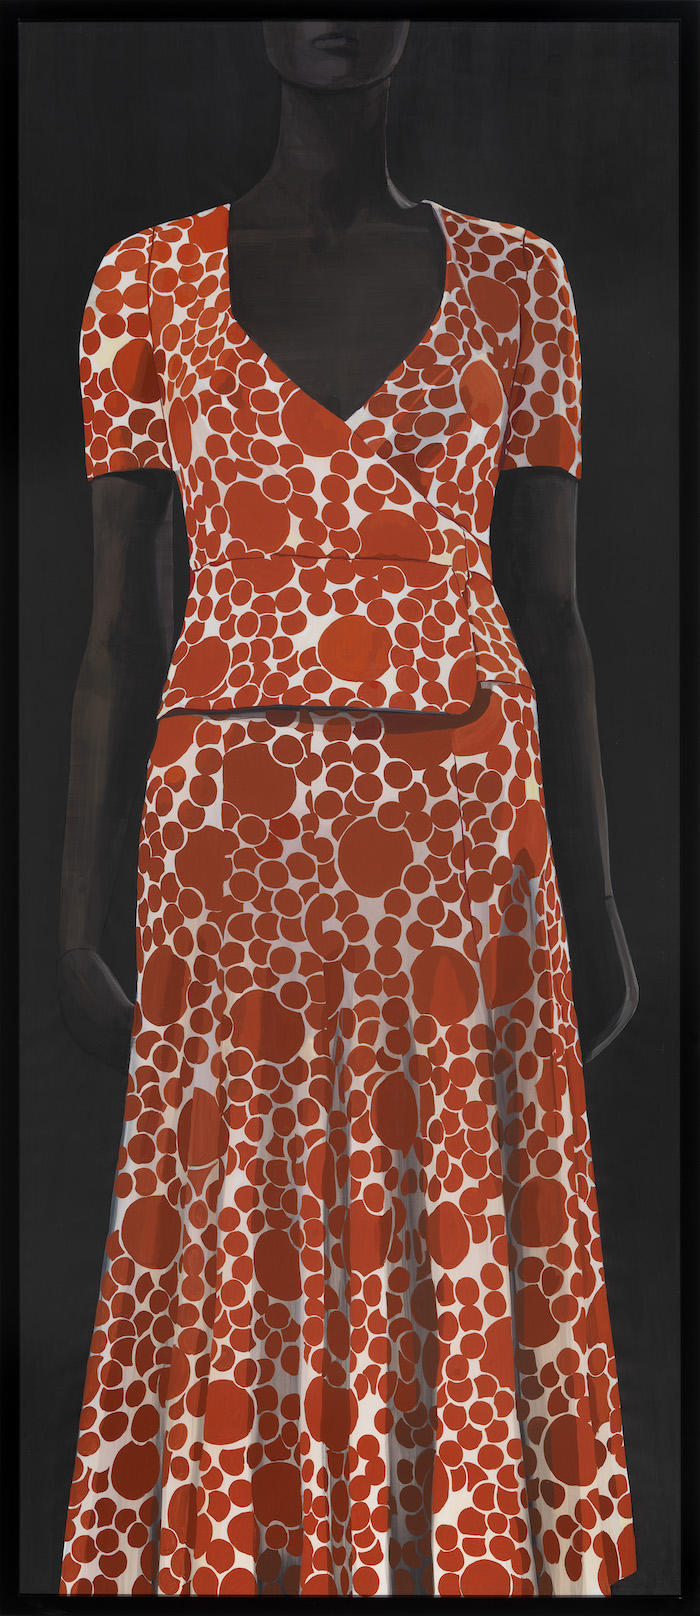 "Paulina Olowska verk från 2014 ""Mycell maxi-dress with wrap-overtop and flared T-shirt - Biba"""